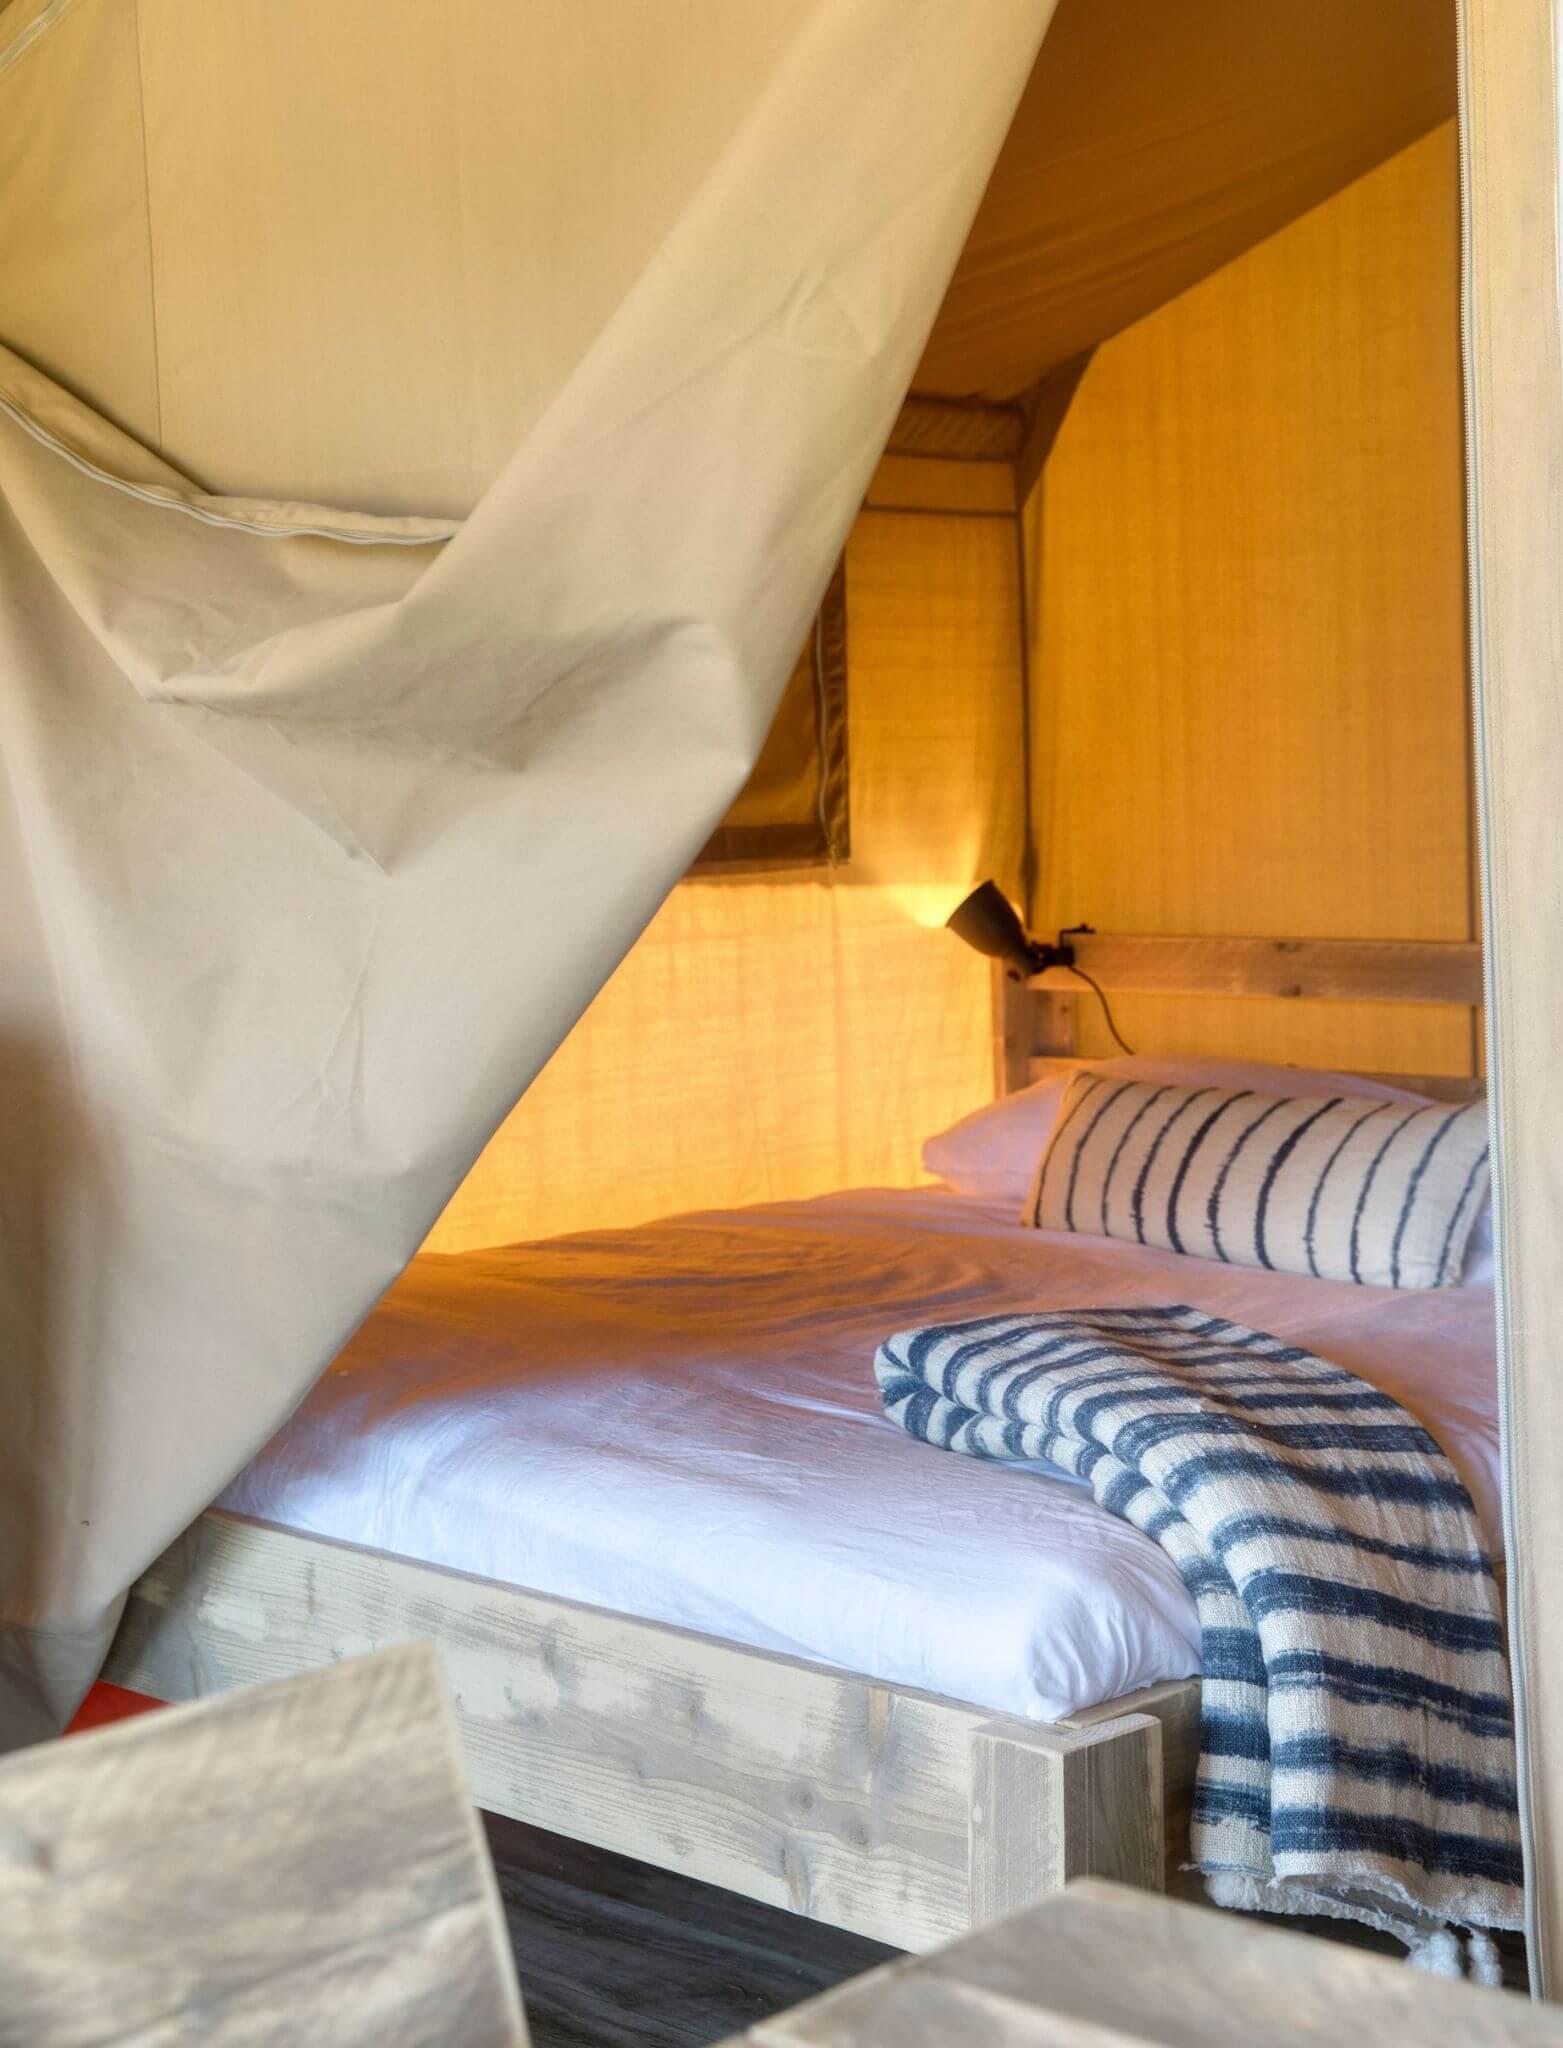 YALA_interior_Raw_bedroom_double_bed